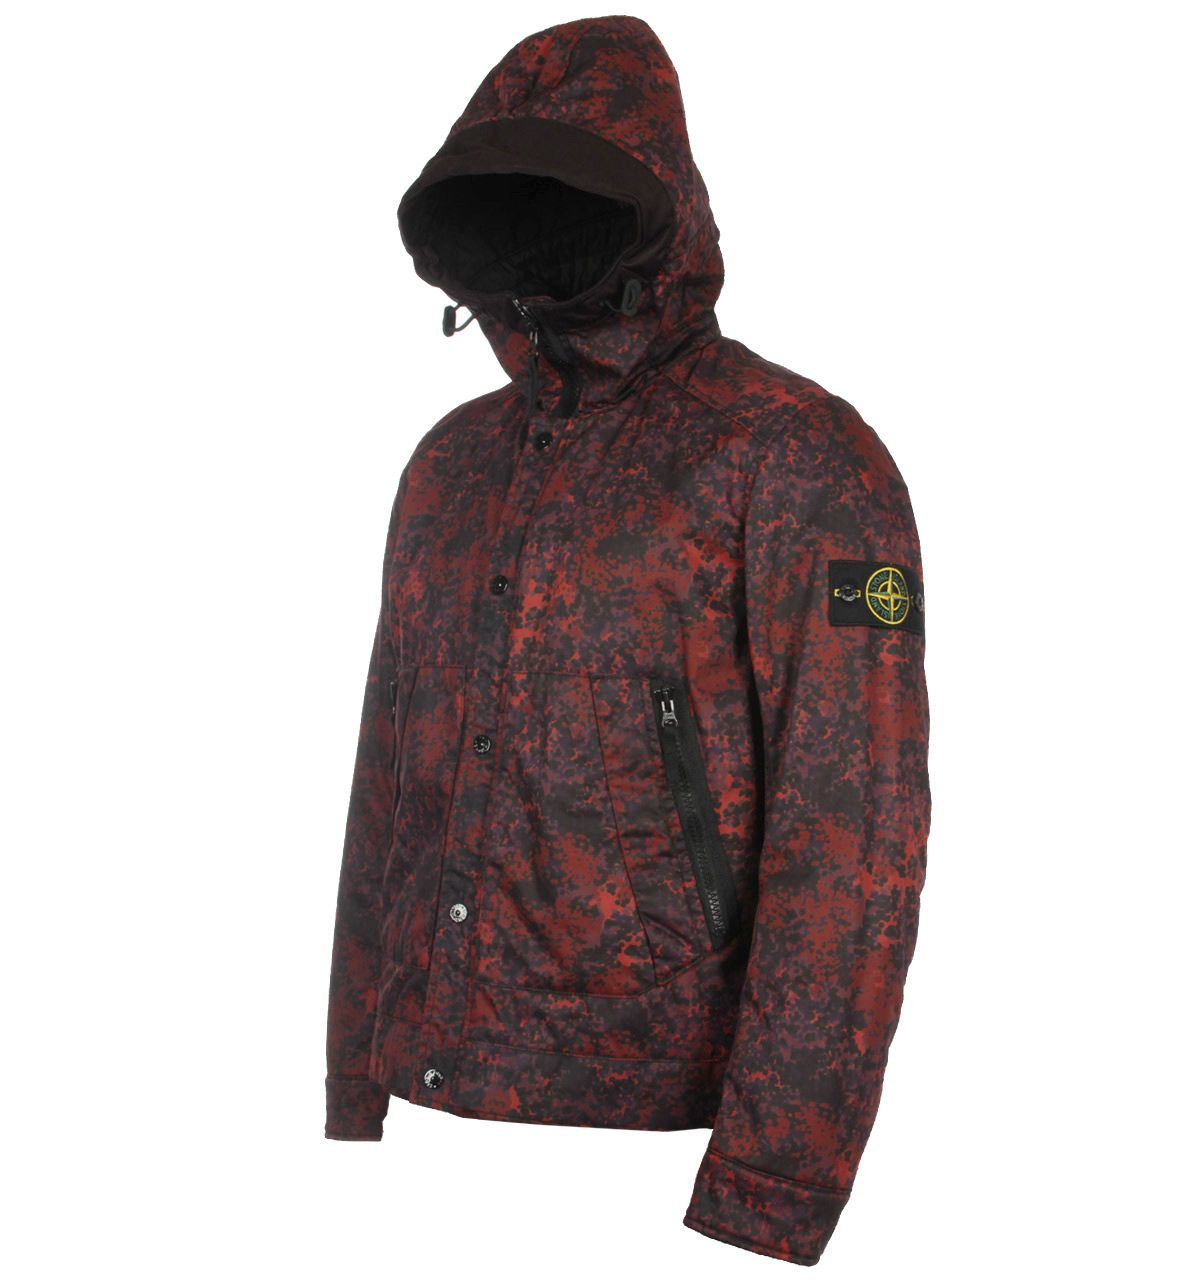 21c0c757 Stone Island Raso Gommato Camo Print-OVD Red & Black Hooded Jacket ...